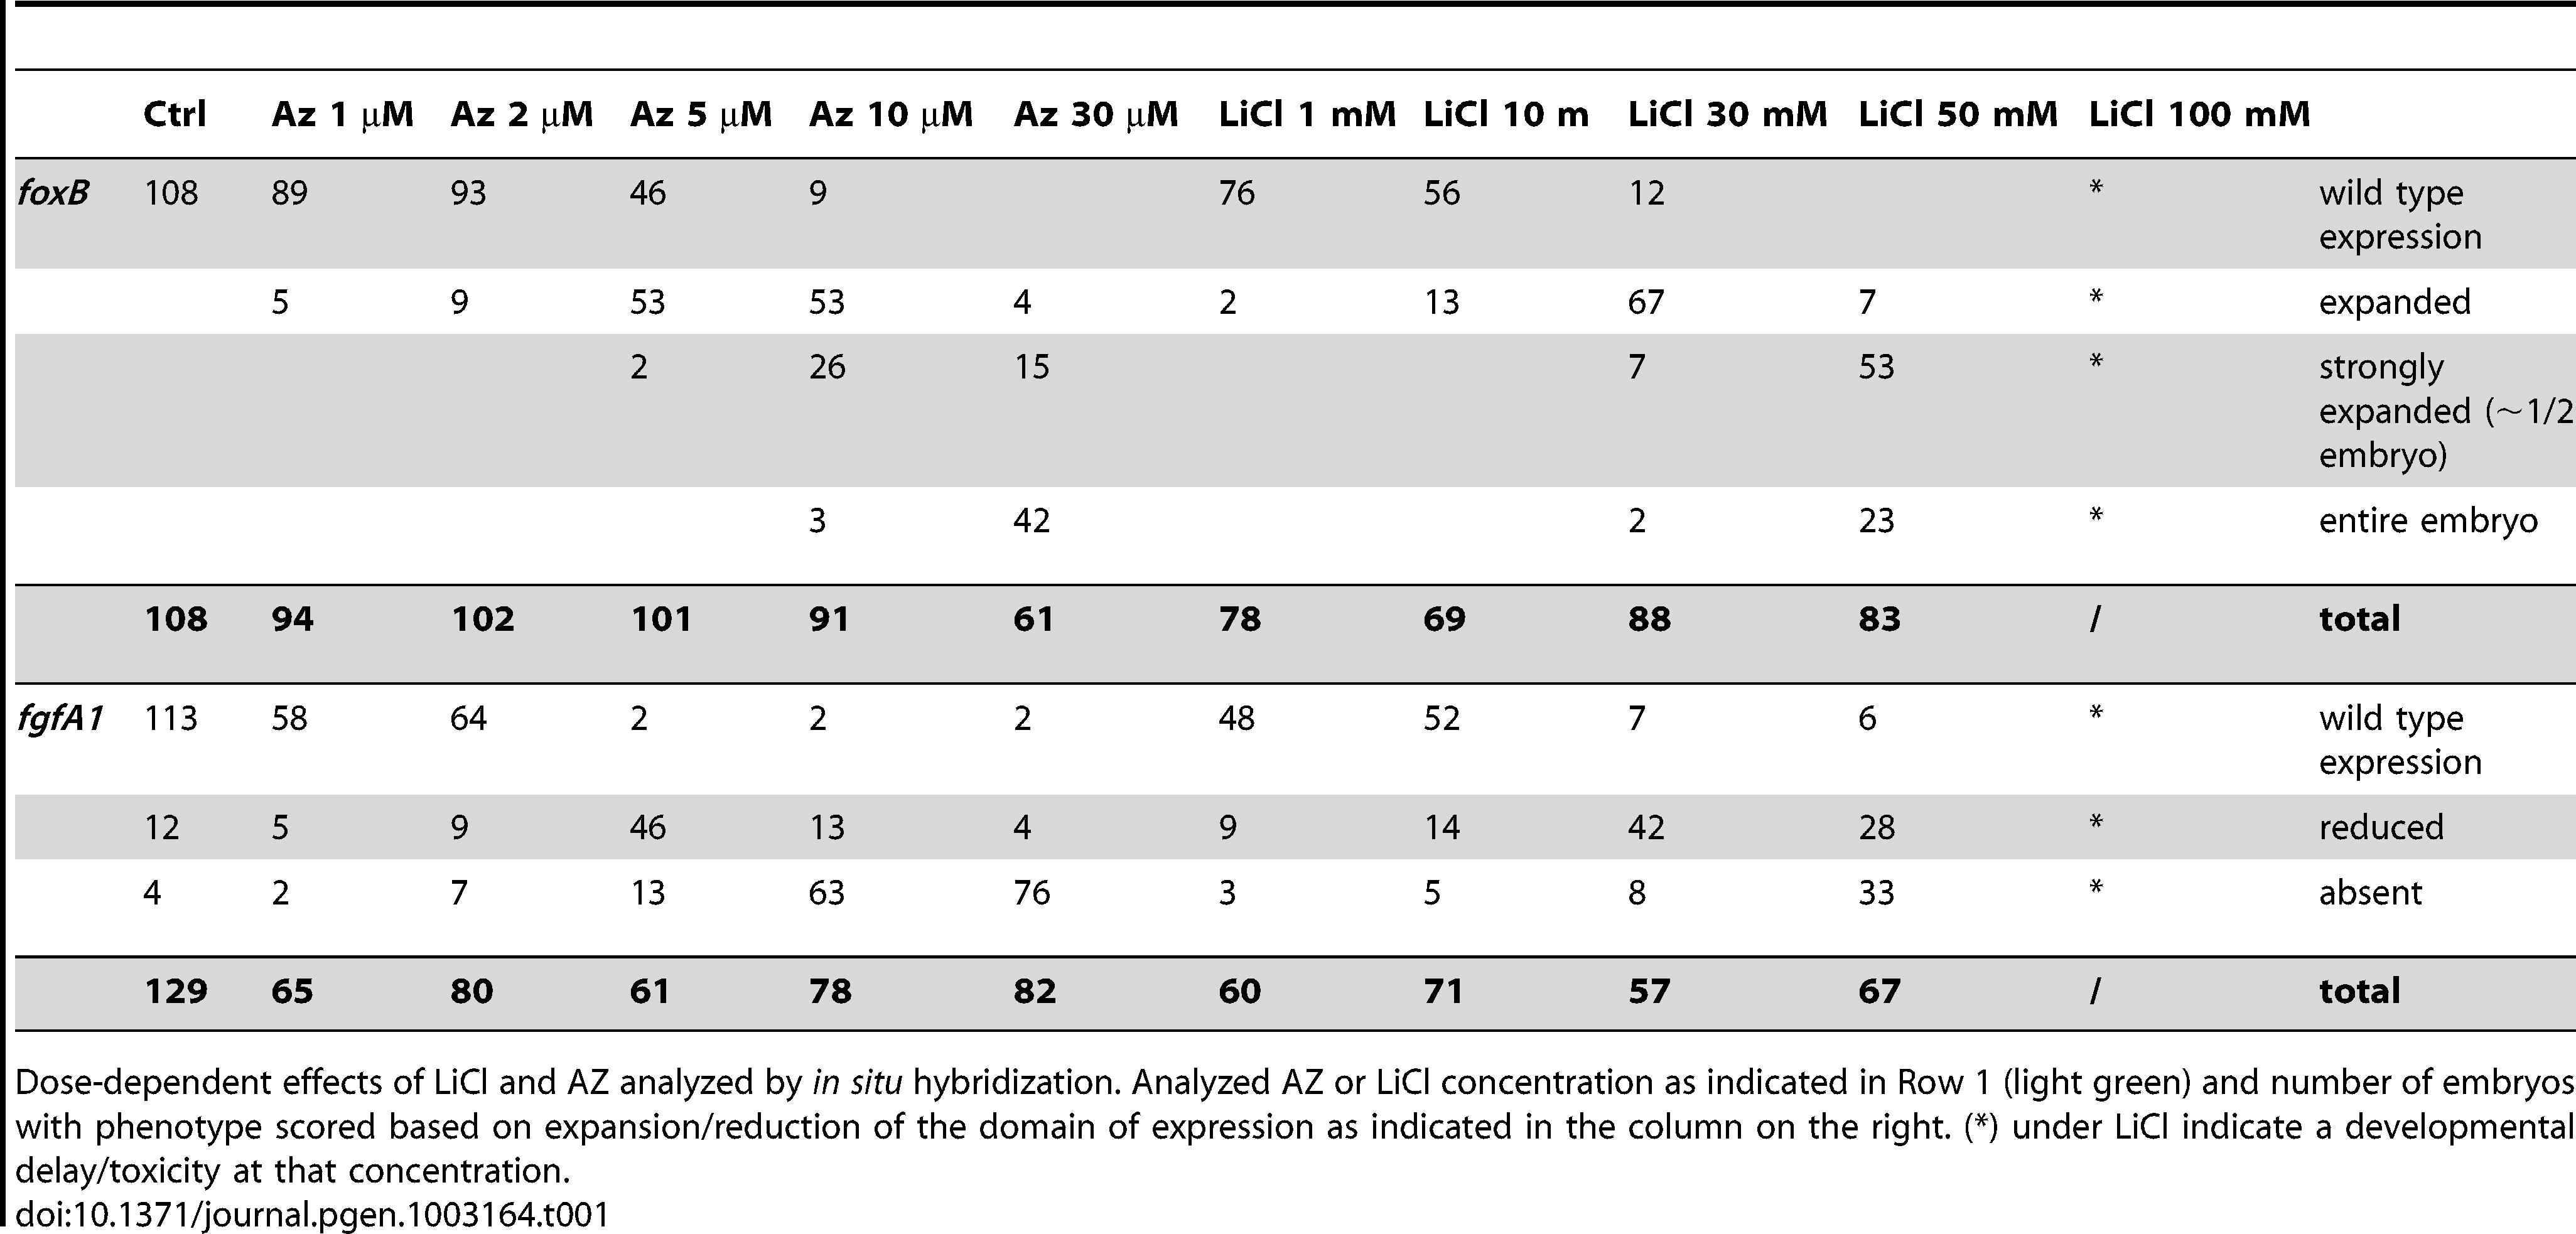 Dose dependent effects of LiCl and AZ on <i>Nv-foxB</i> and <i>Nv-fgfA1</i> expression.